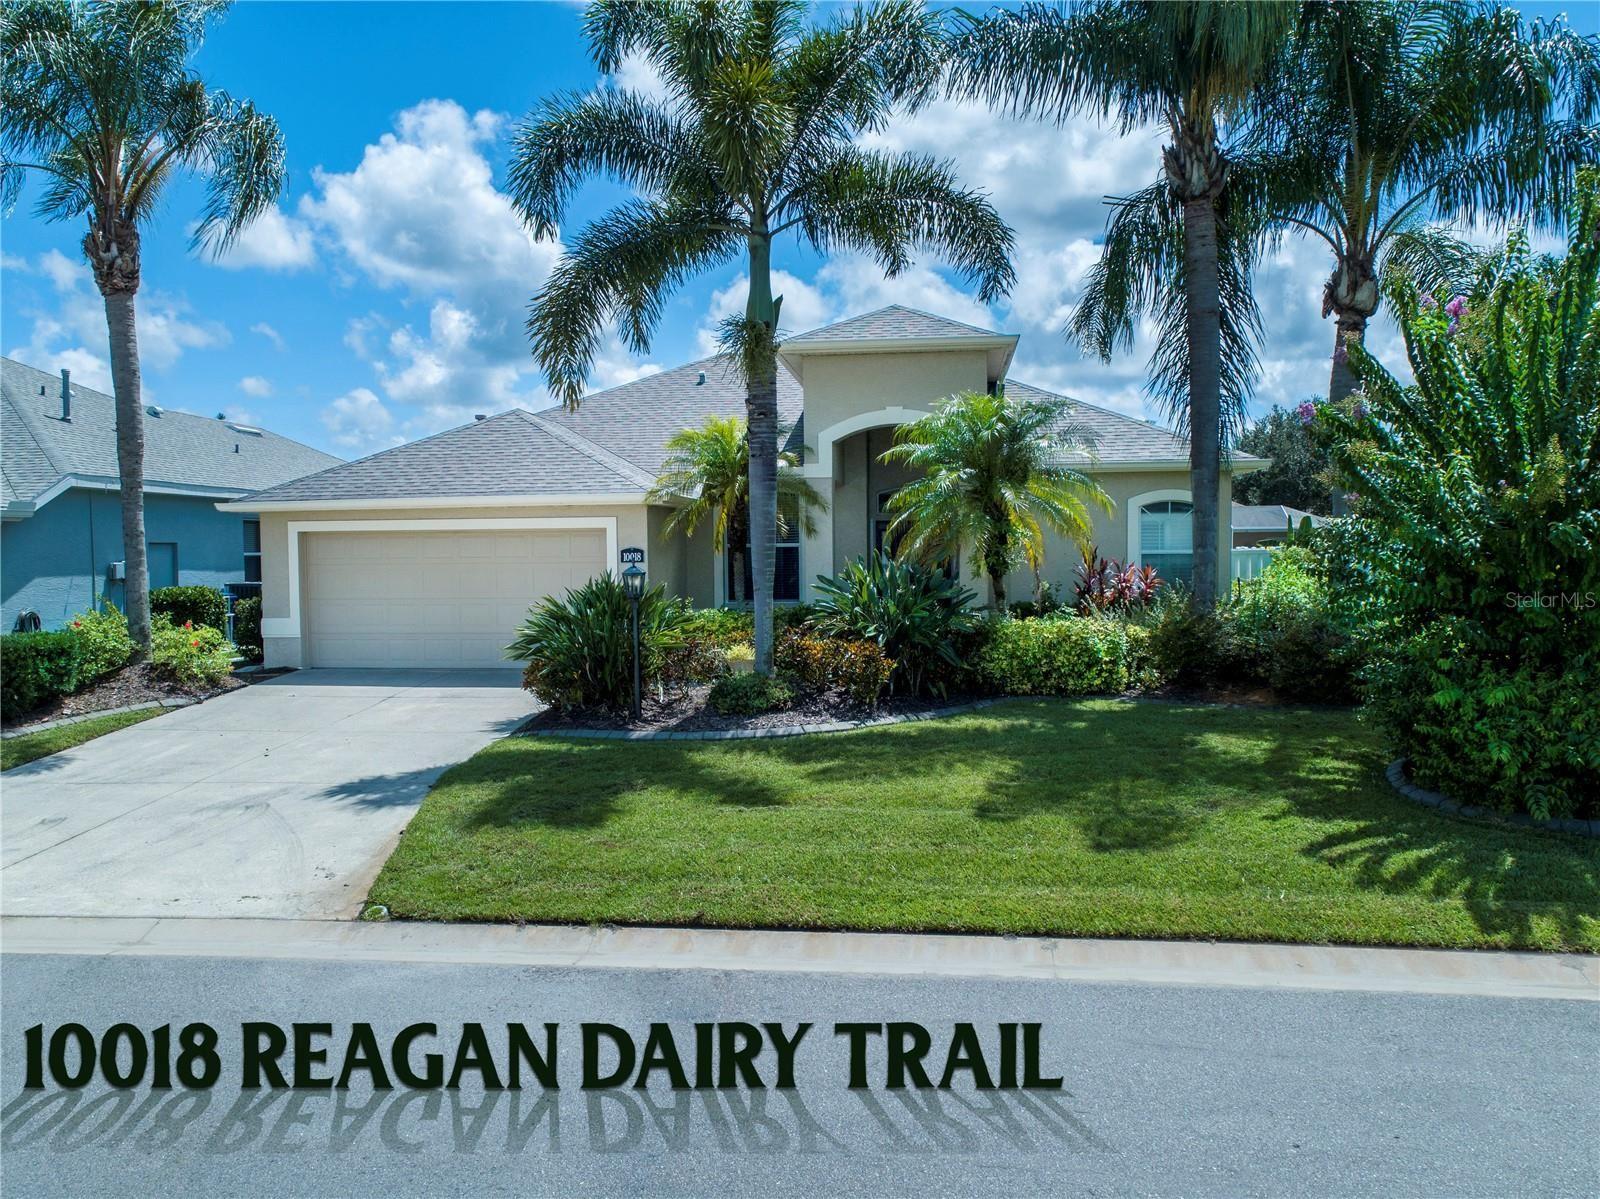 Photo of 10018 REAGAN DAIRY TRAIL, BRADENTON, FL 34212 (MLS # A4508400)